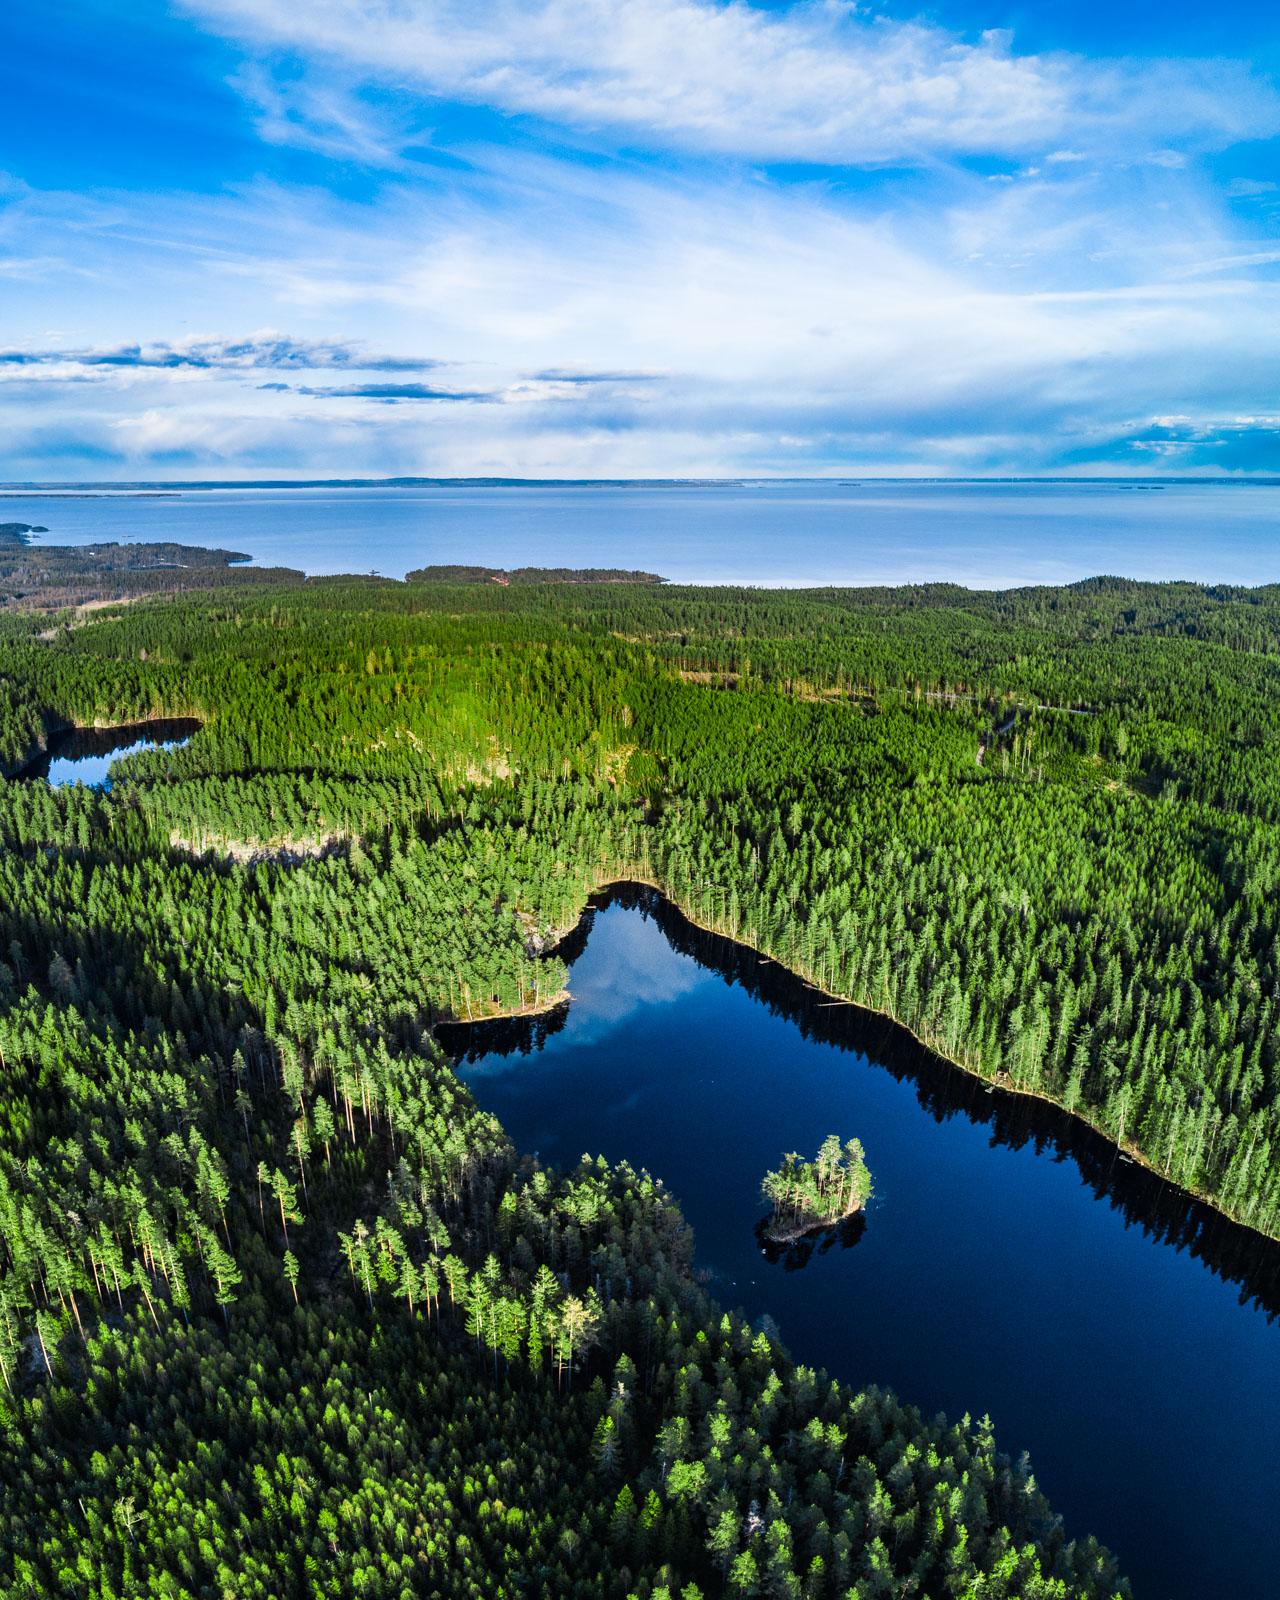 Aerial photographer, Djäknasjön, Tiveden, Karlsborg, Sweden